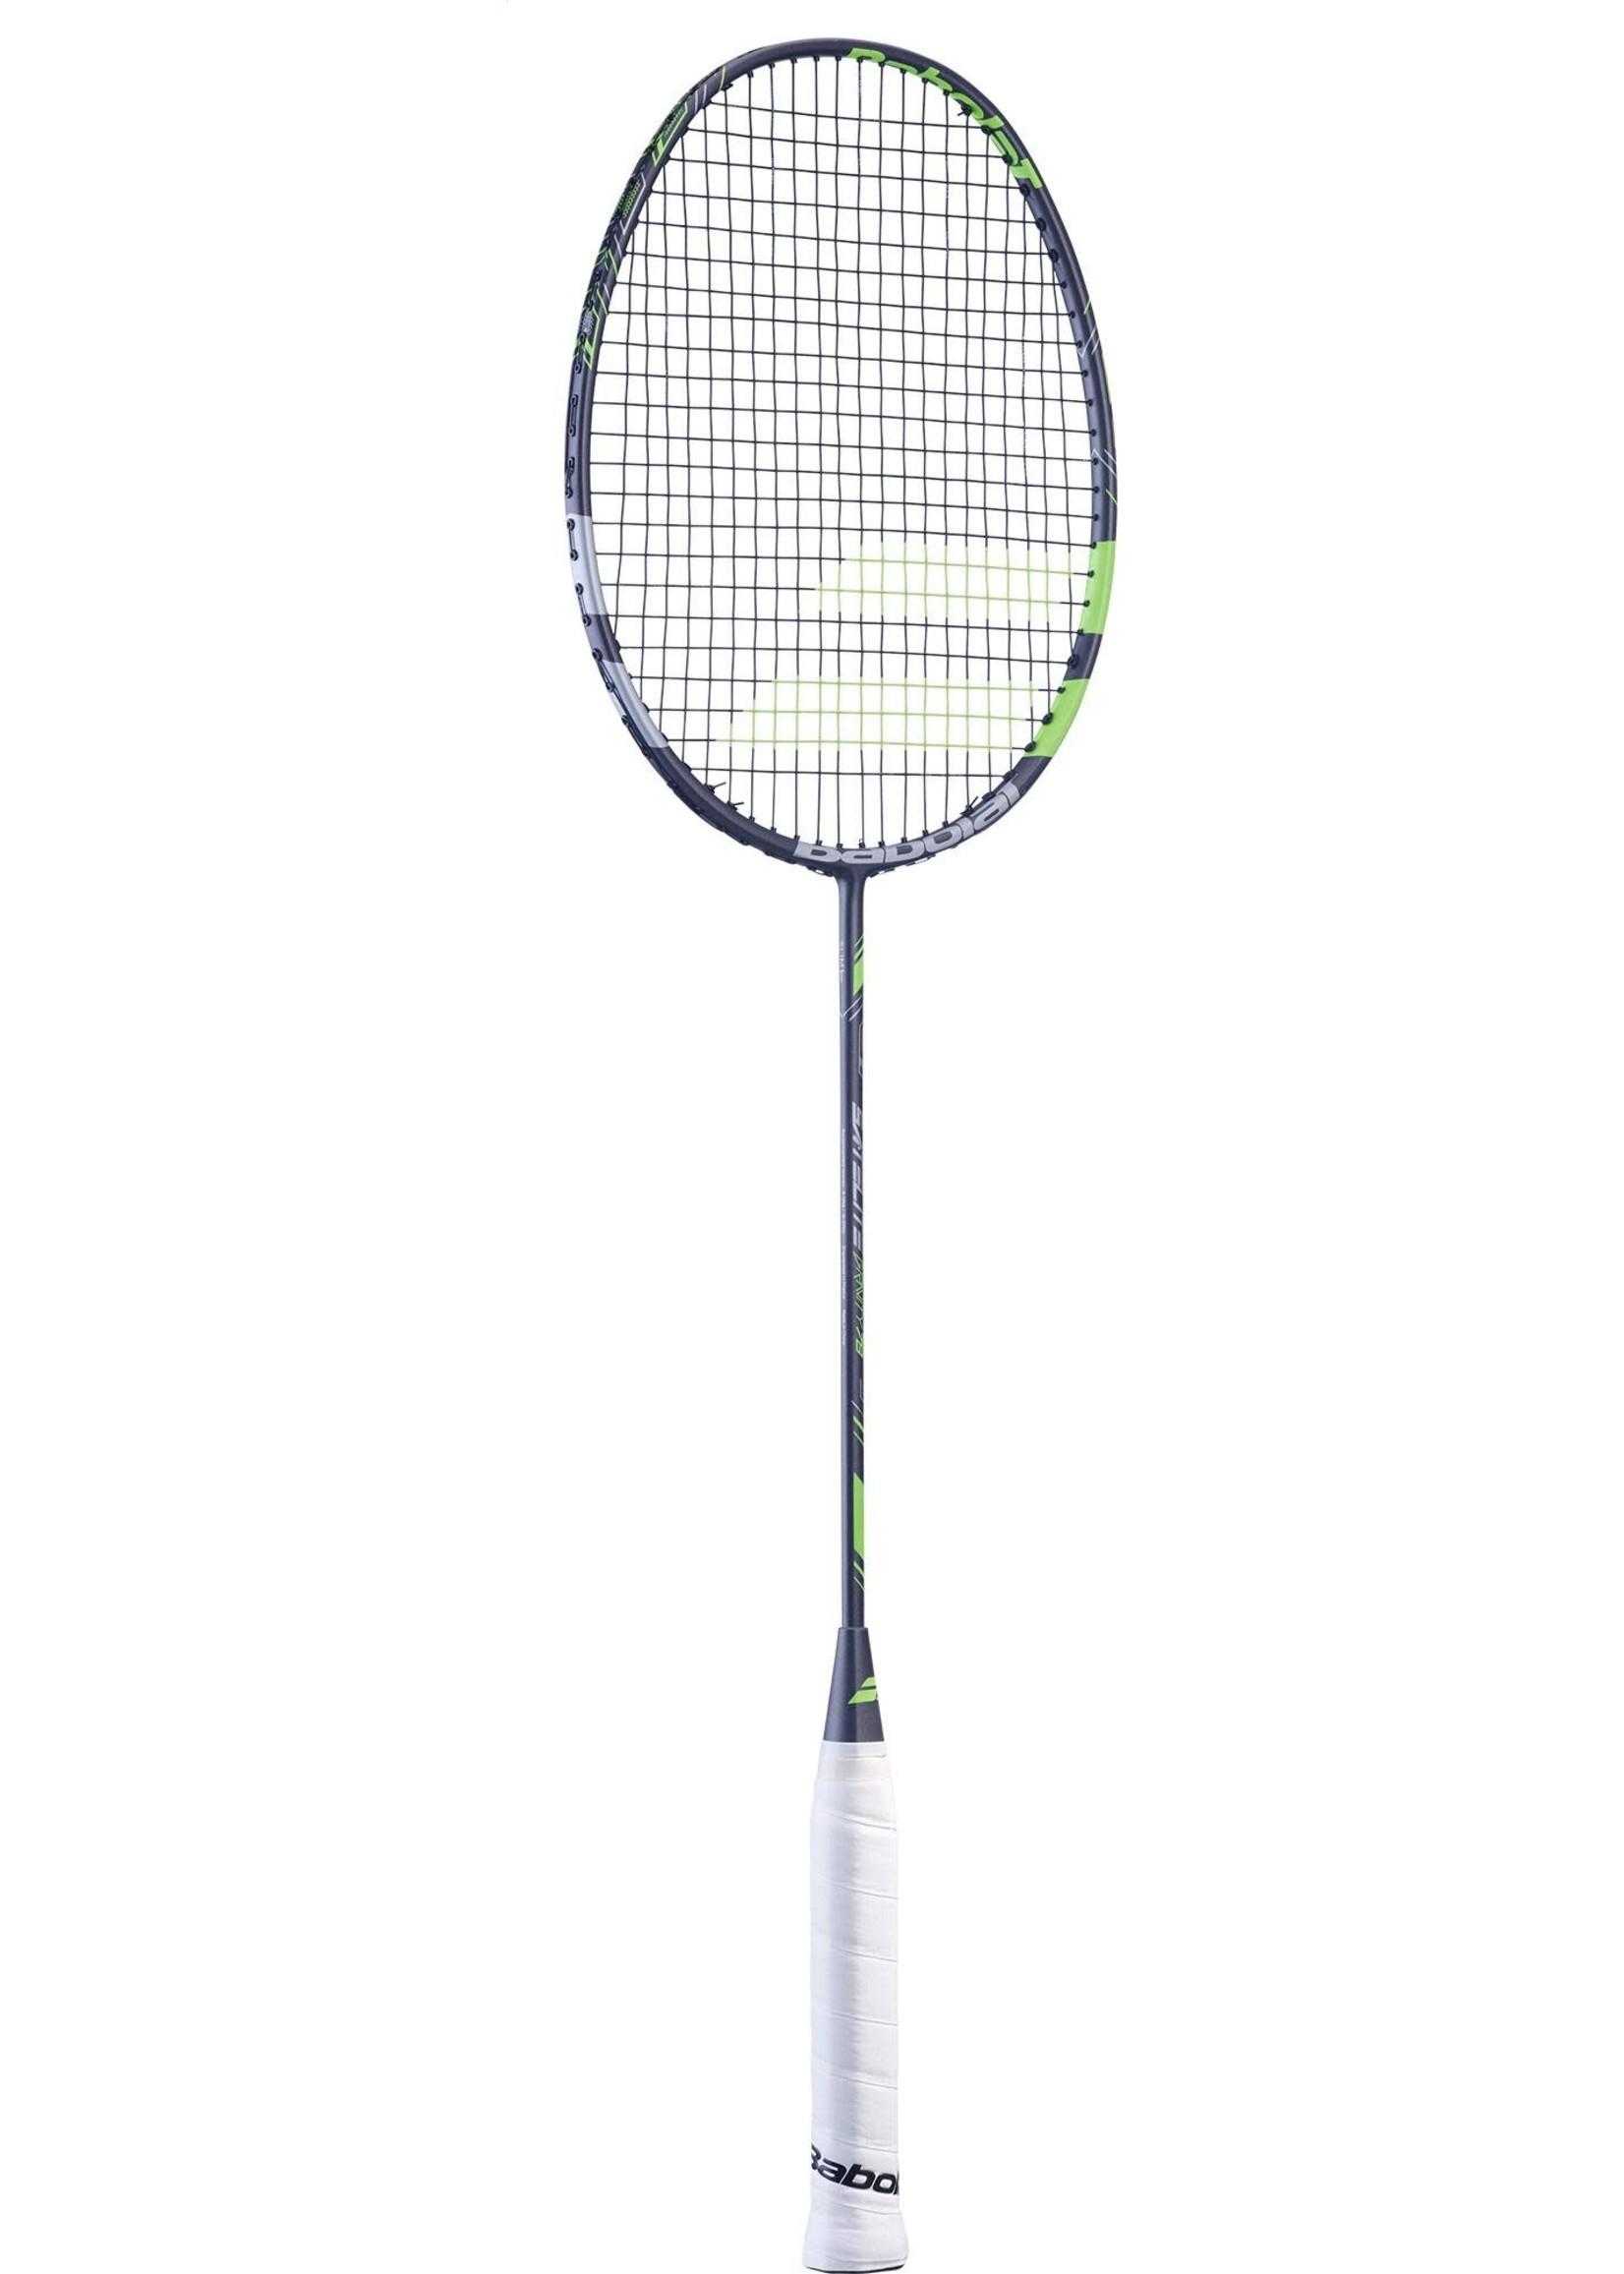 Babolat Babolat Satelite Gravity 78 Badminton Racket (2019)